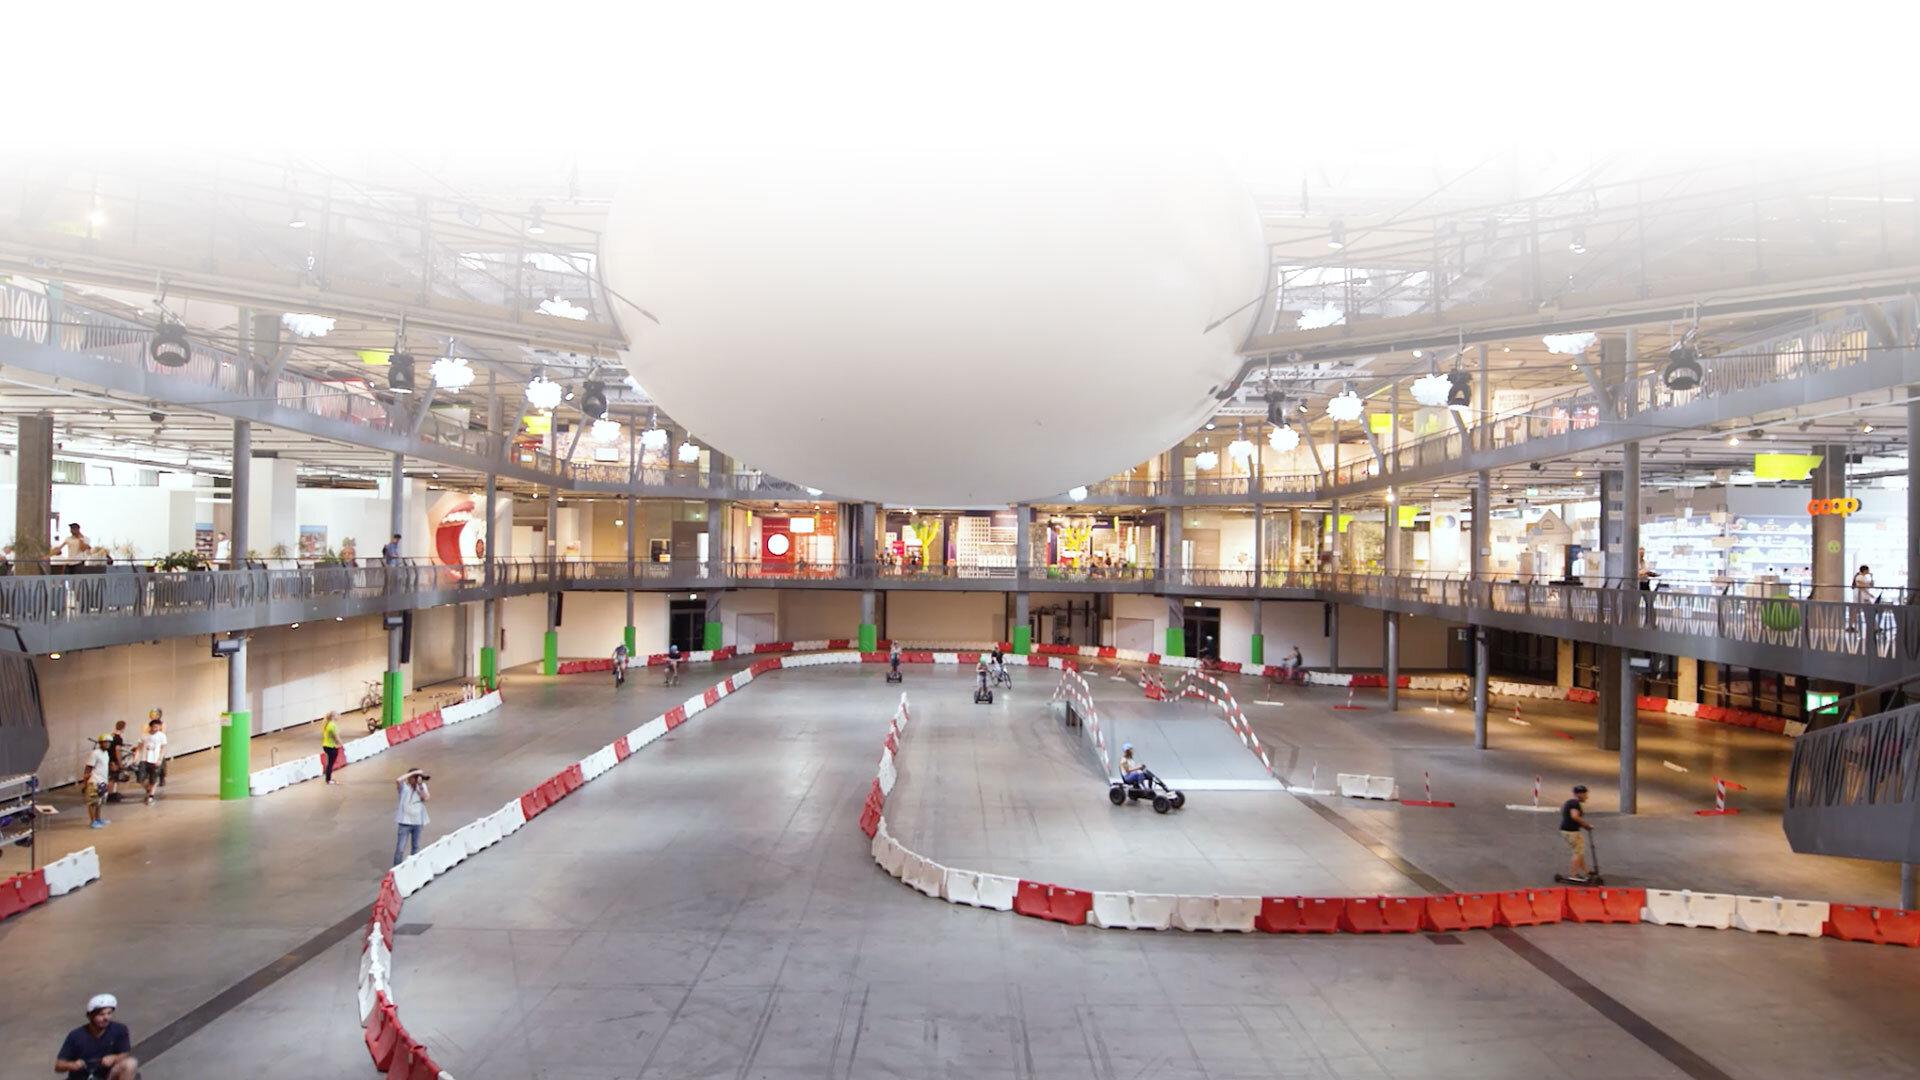 Umwelt Arena Switzerland